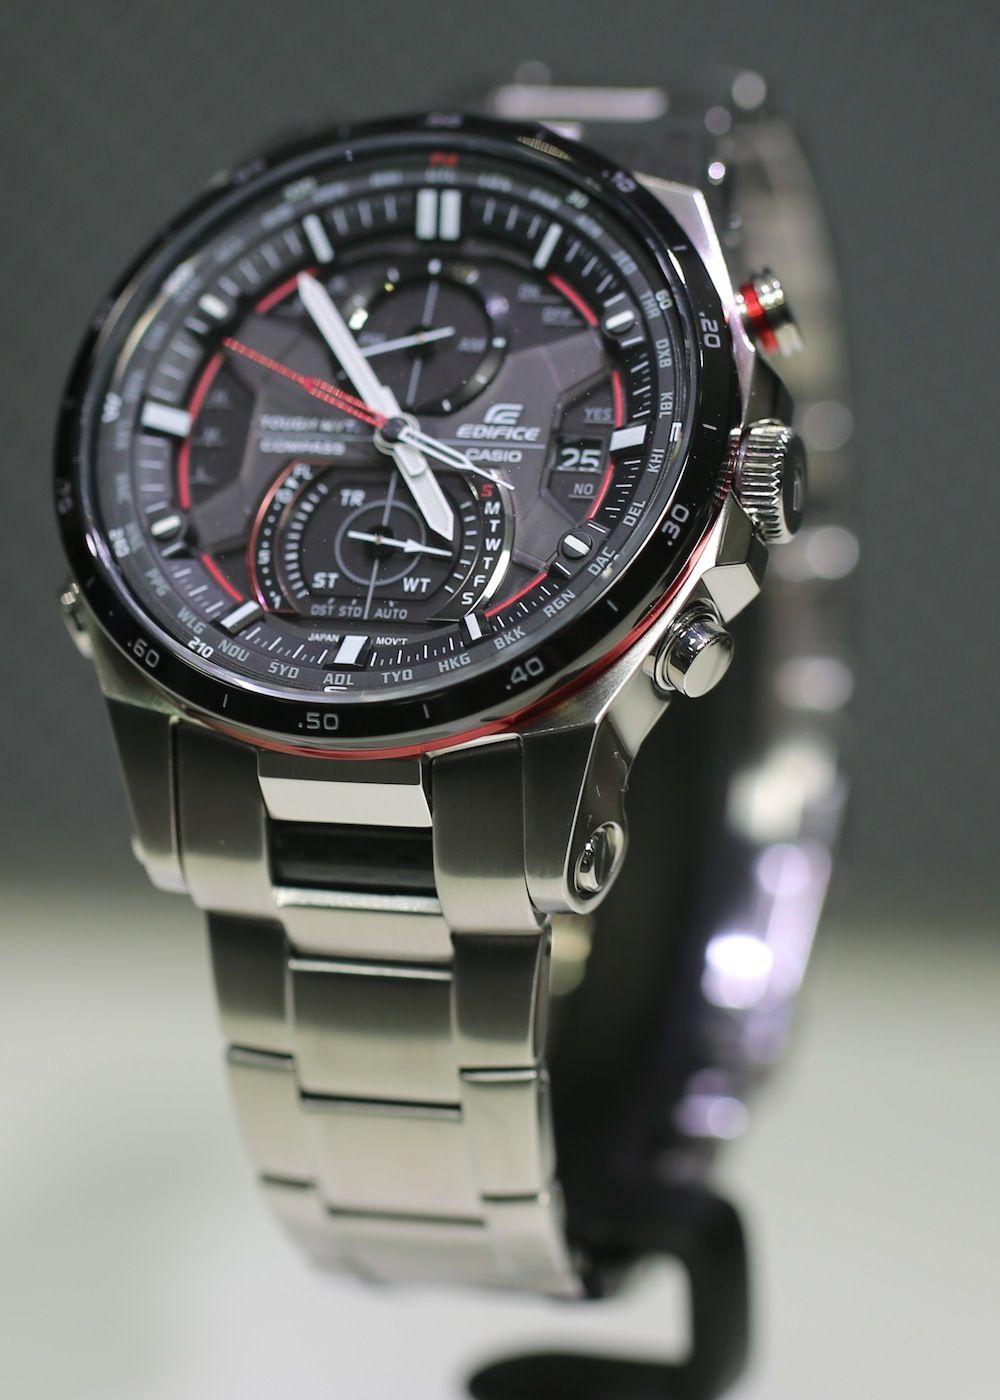 5e53d09ba5b Casio Edifice EQW-A1200 Sensor Chronograph Watch